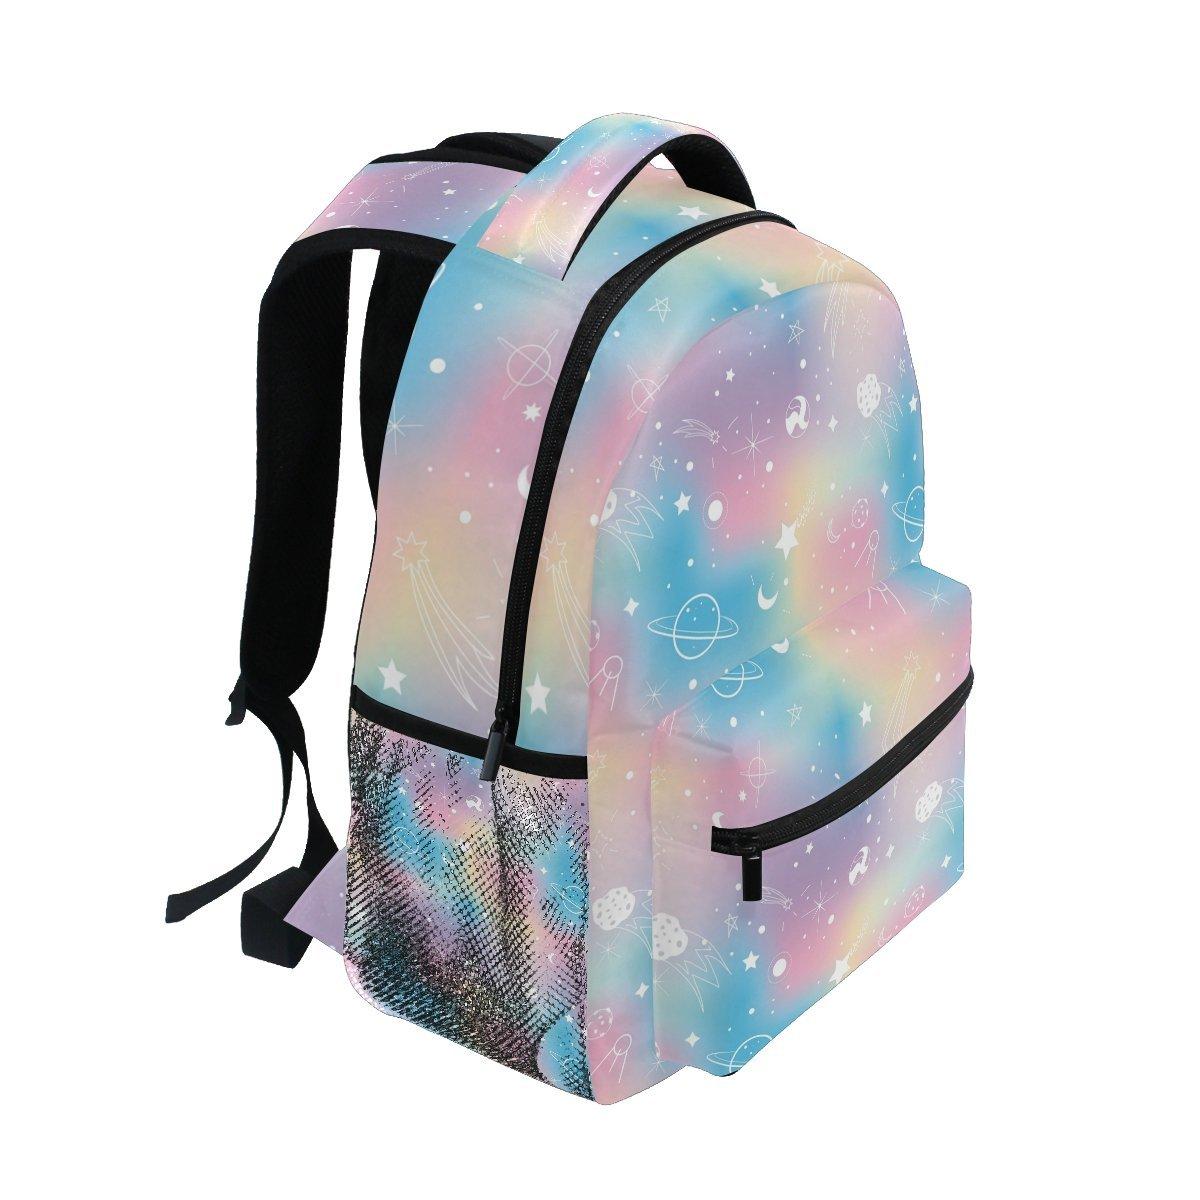 bd3a3448c185 Amazon.com  ZOEO School Backpacks Unicorn Rainbow Planet 3th 4th 5th Grade  Travel Daypack Bag Purse for Boys Girls  ZOEO